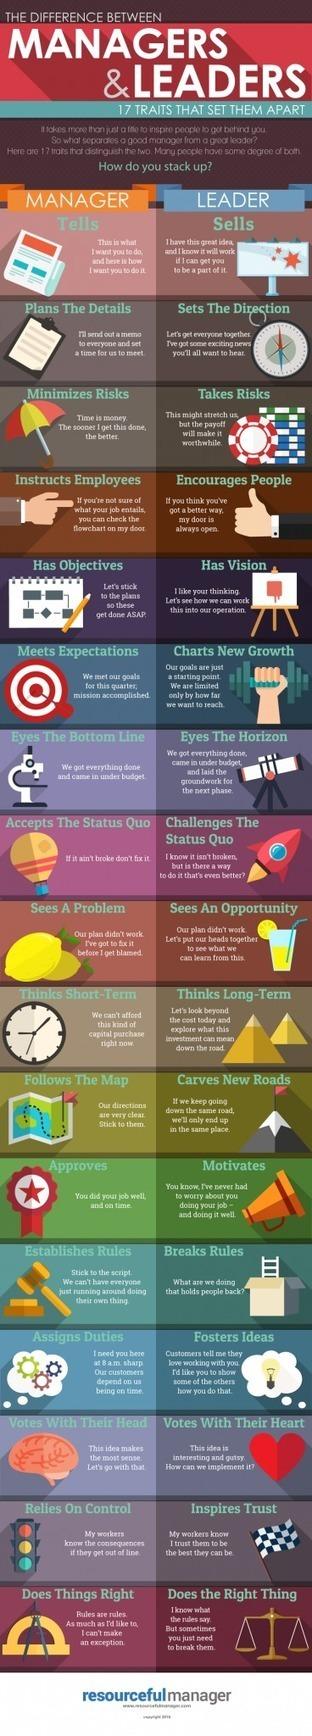 Leaders vs Managers: 17 Traits That Set Them Apart Infographic | Teacher's corner | Scoop.it